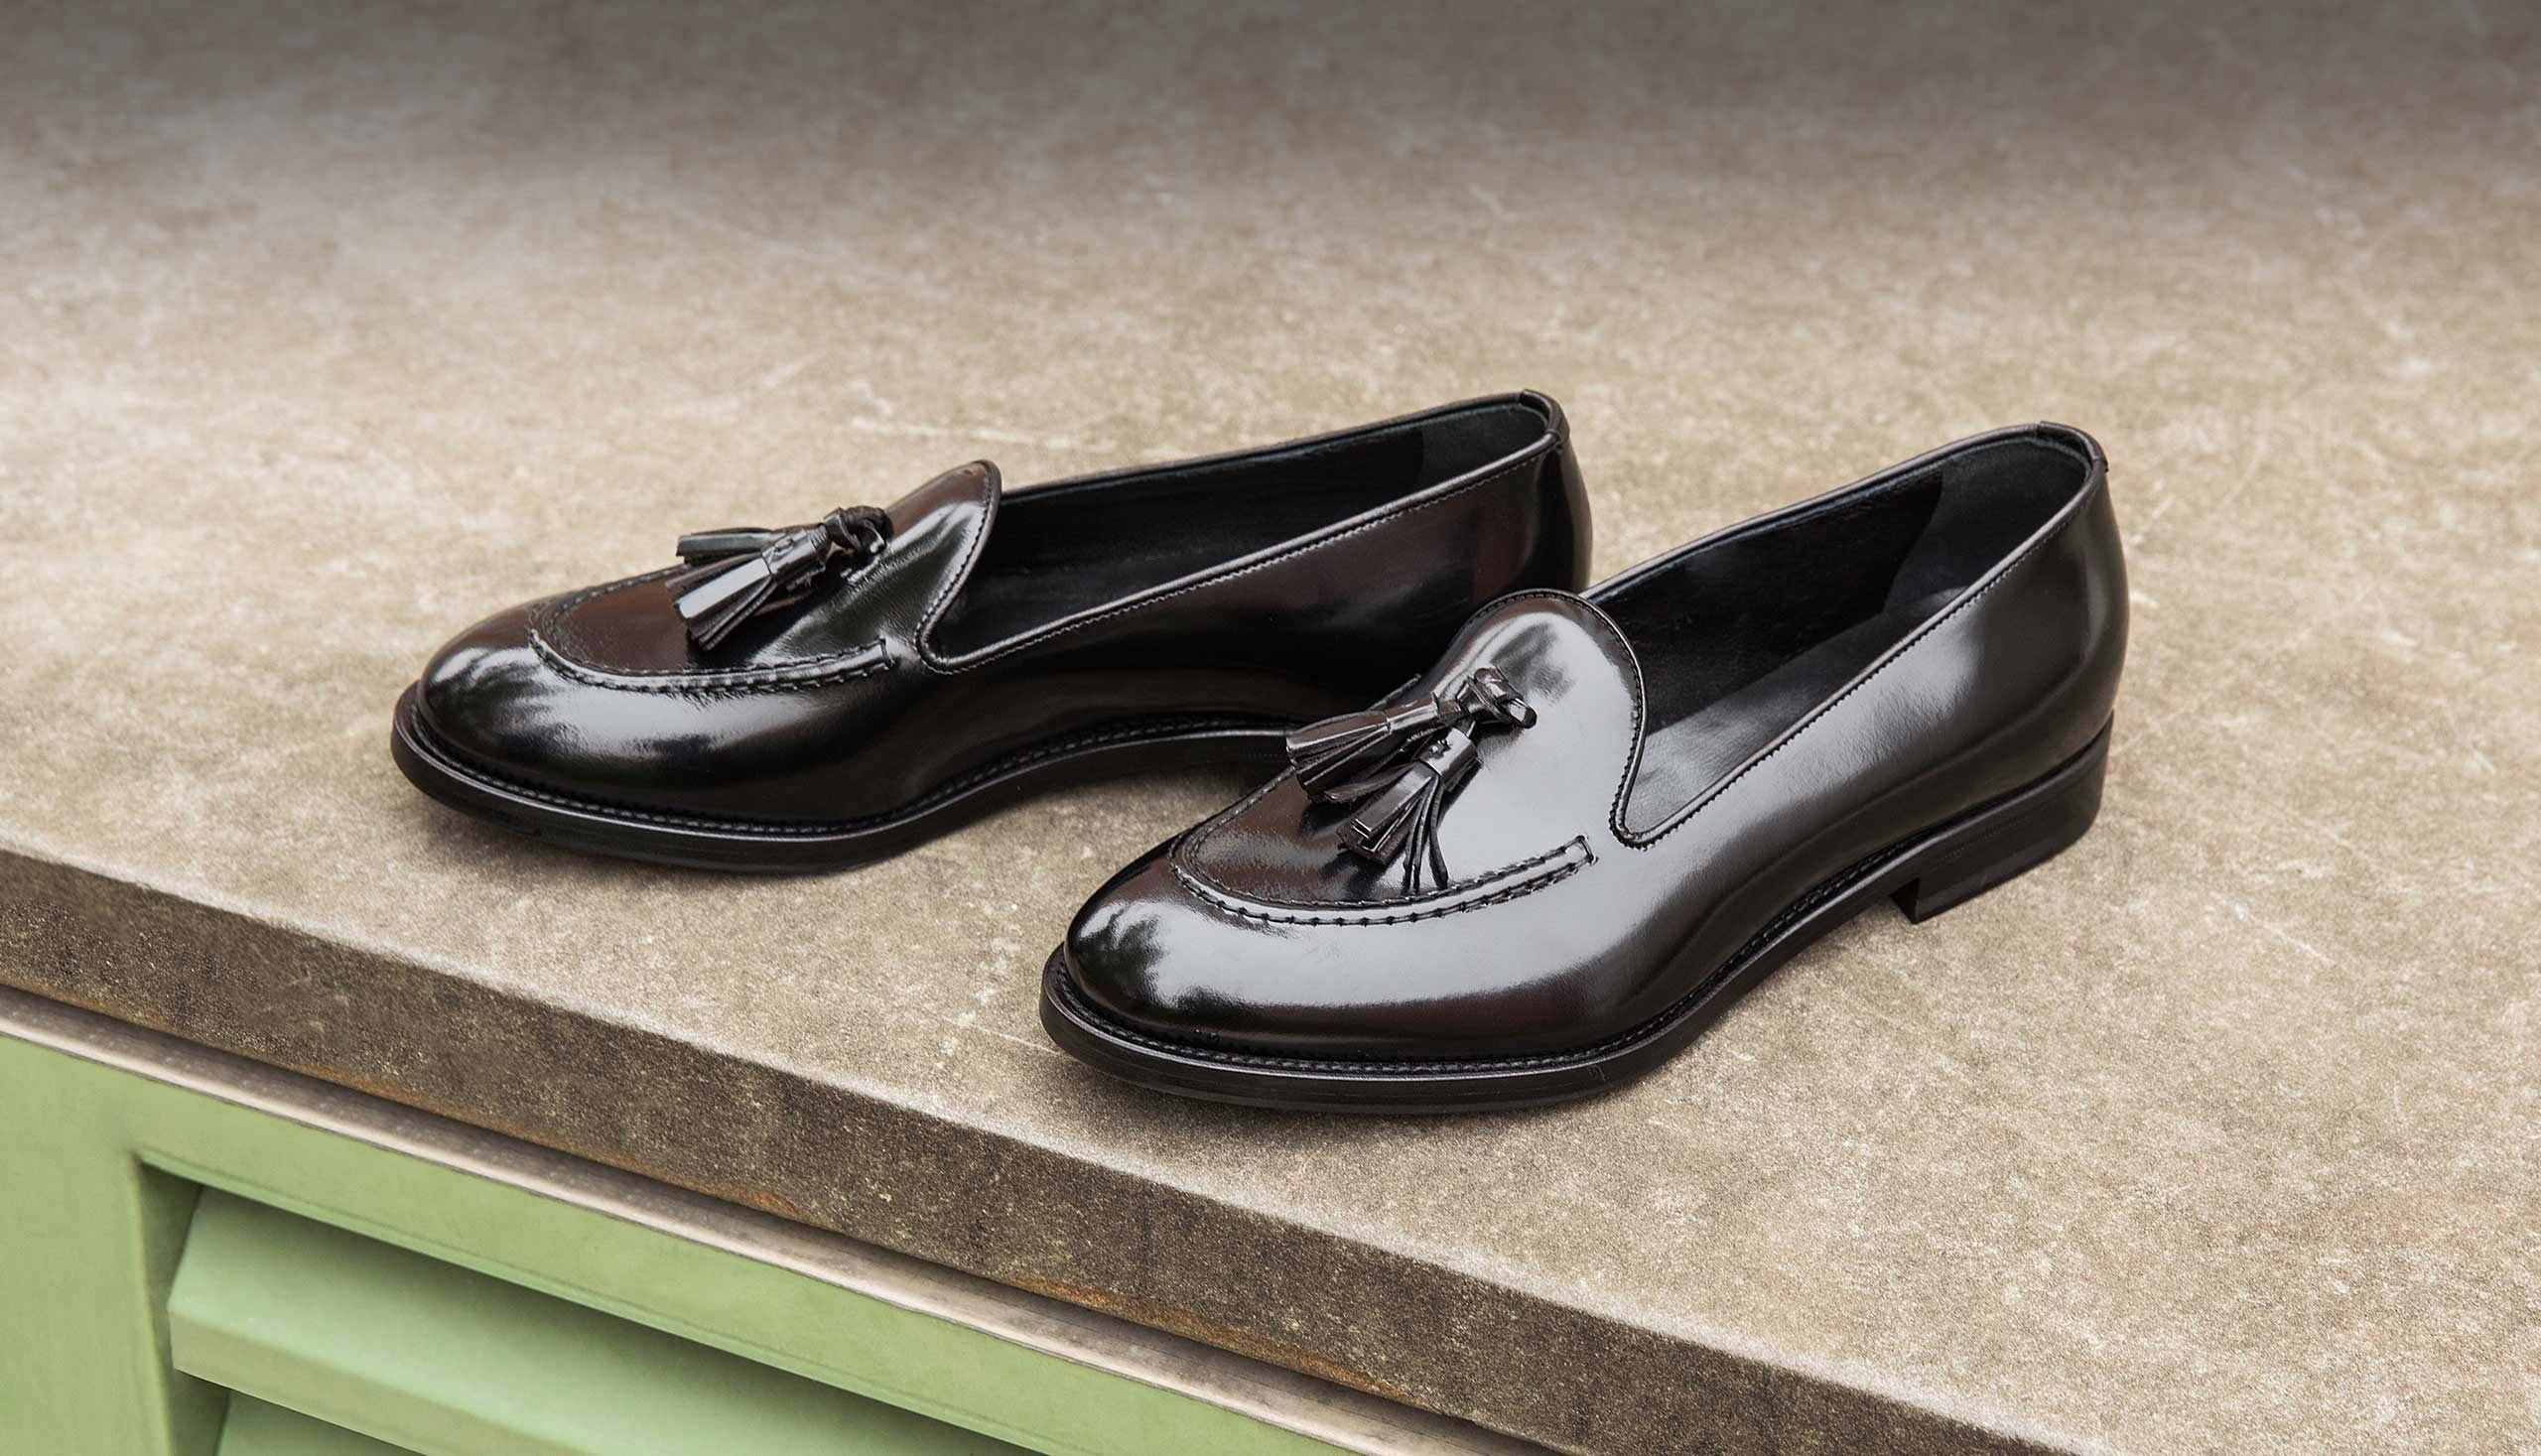 14eadc64eaf Scarosso Luxury Italian shoes for Men and Women 387925 ...